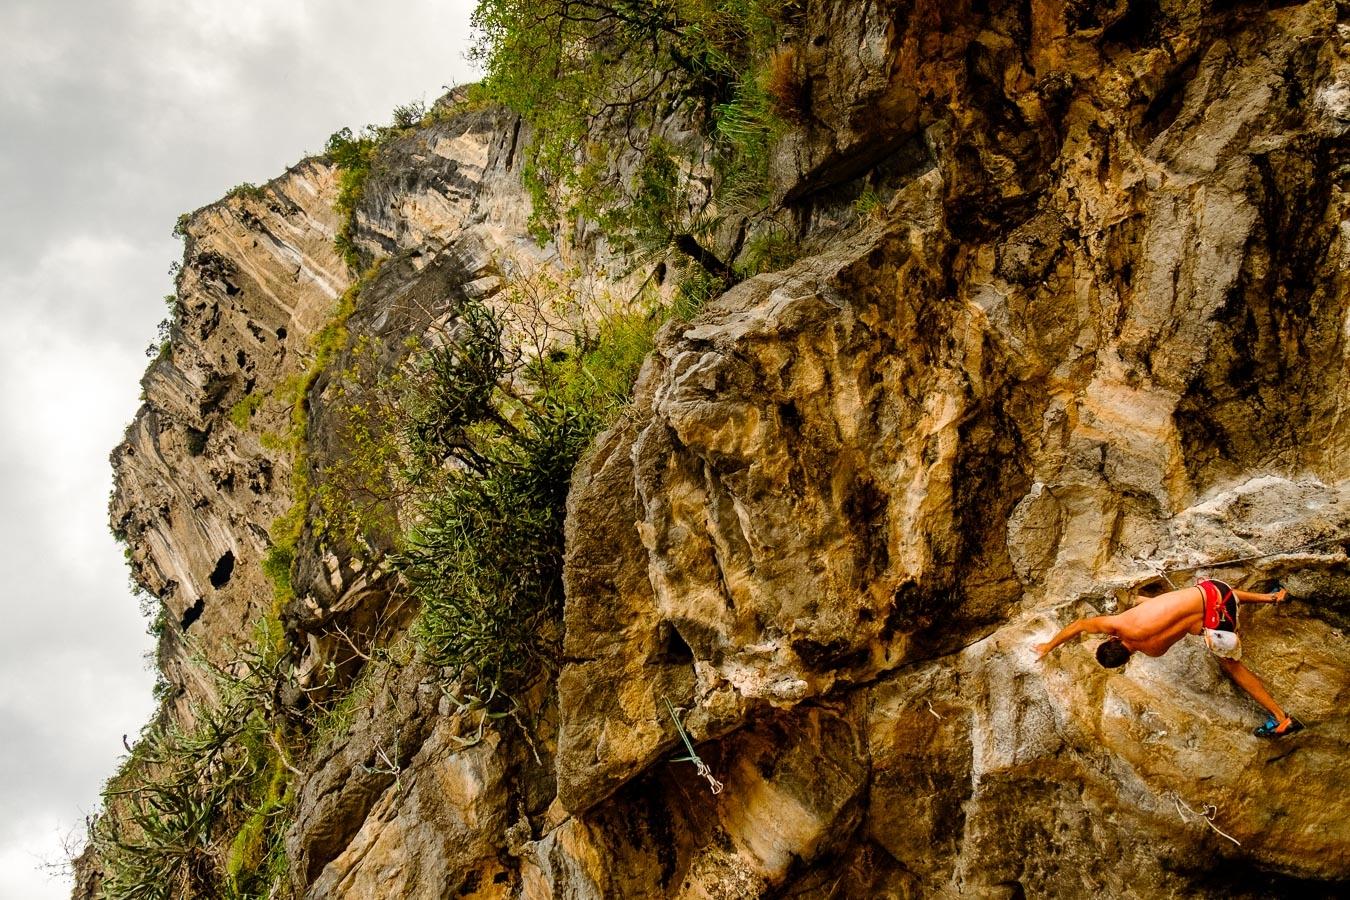 Photographie de voyage - escalade à Railay, Thaïlande